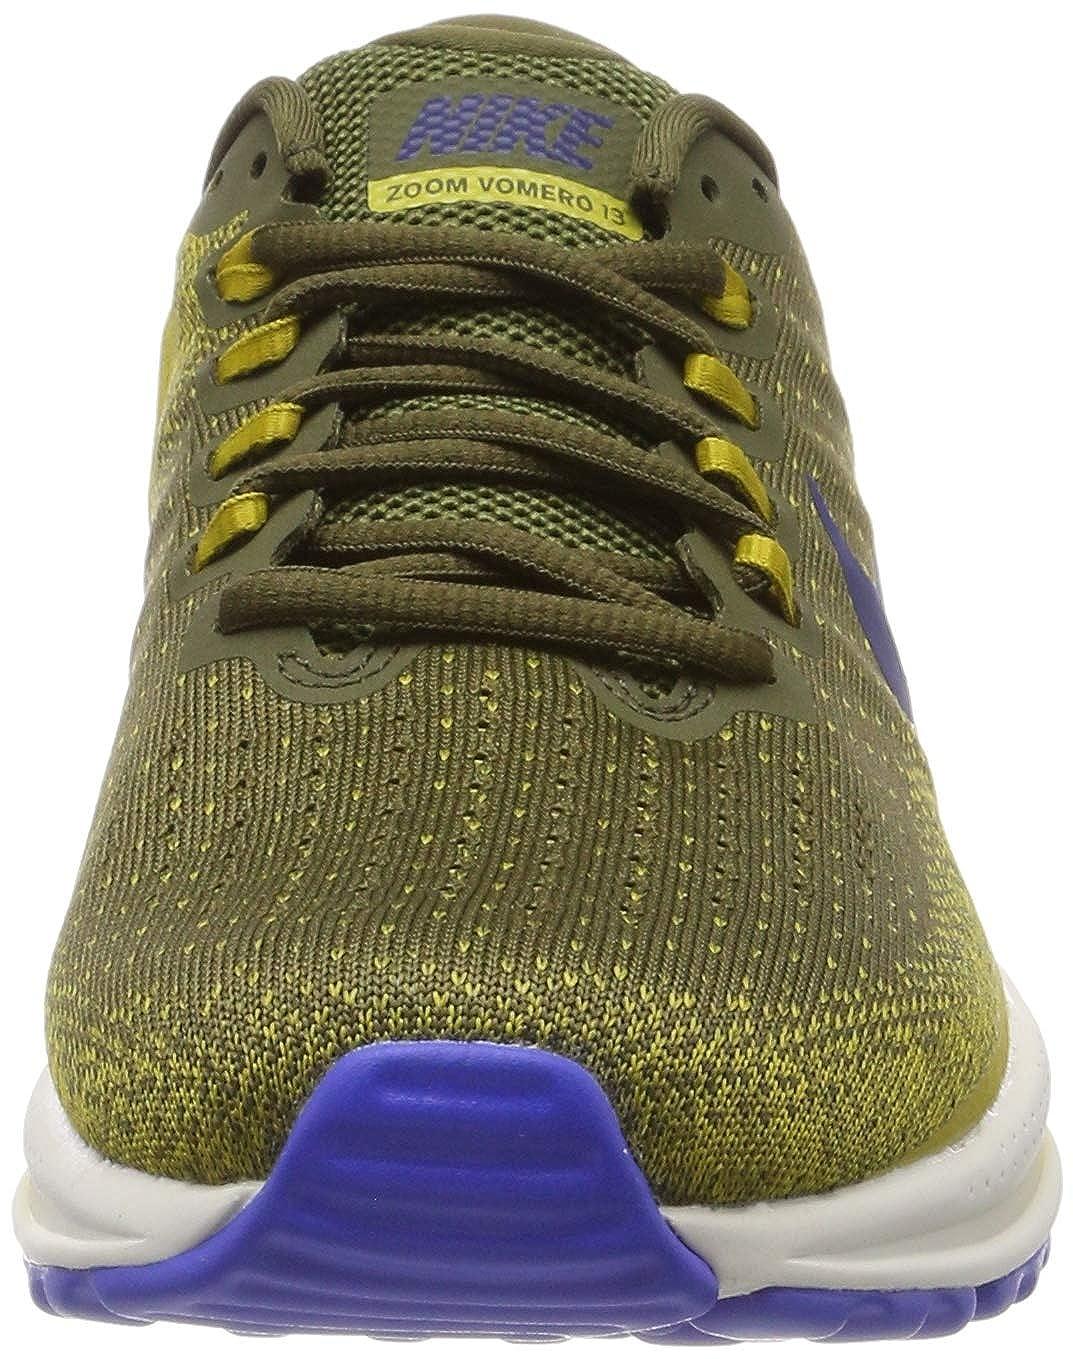 Nike Herren Herren Herren Air Zoom Vomero 13 Laufschuhe B07HYY6FXS ... Verpackungsvielfalt